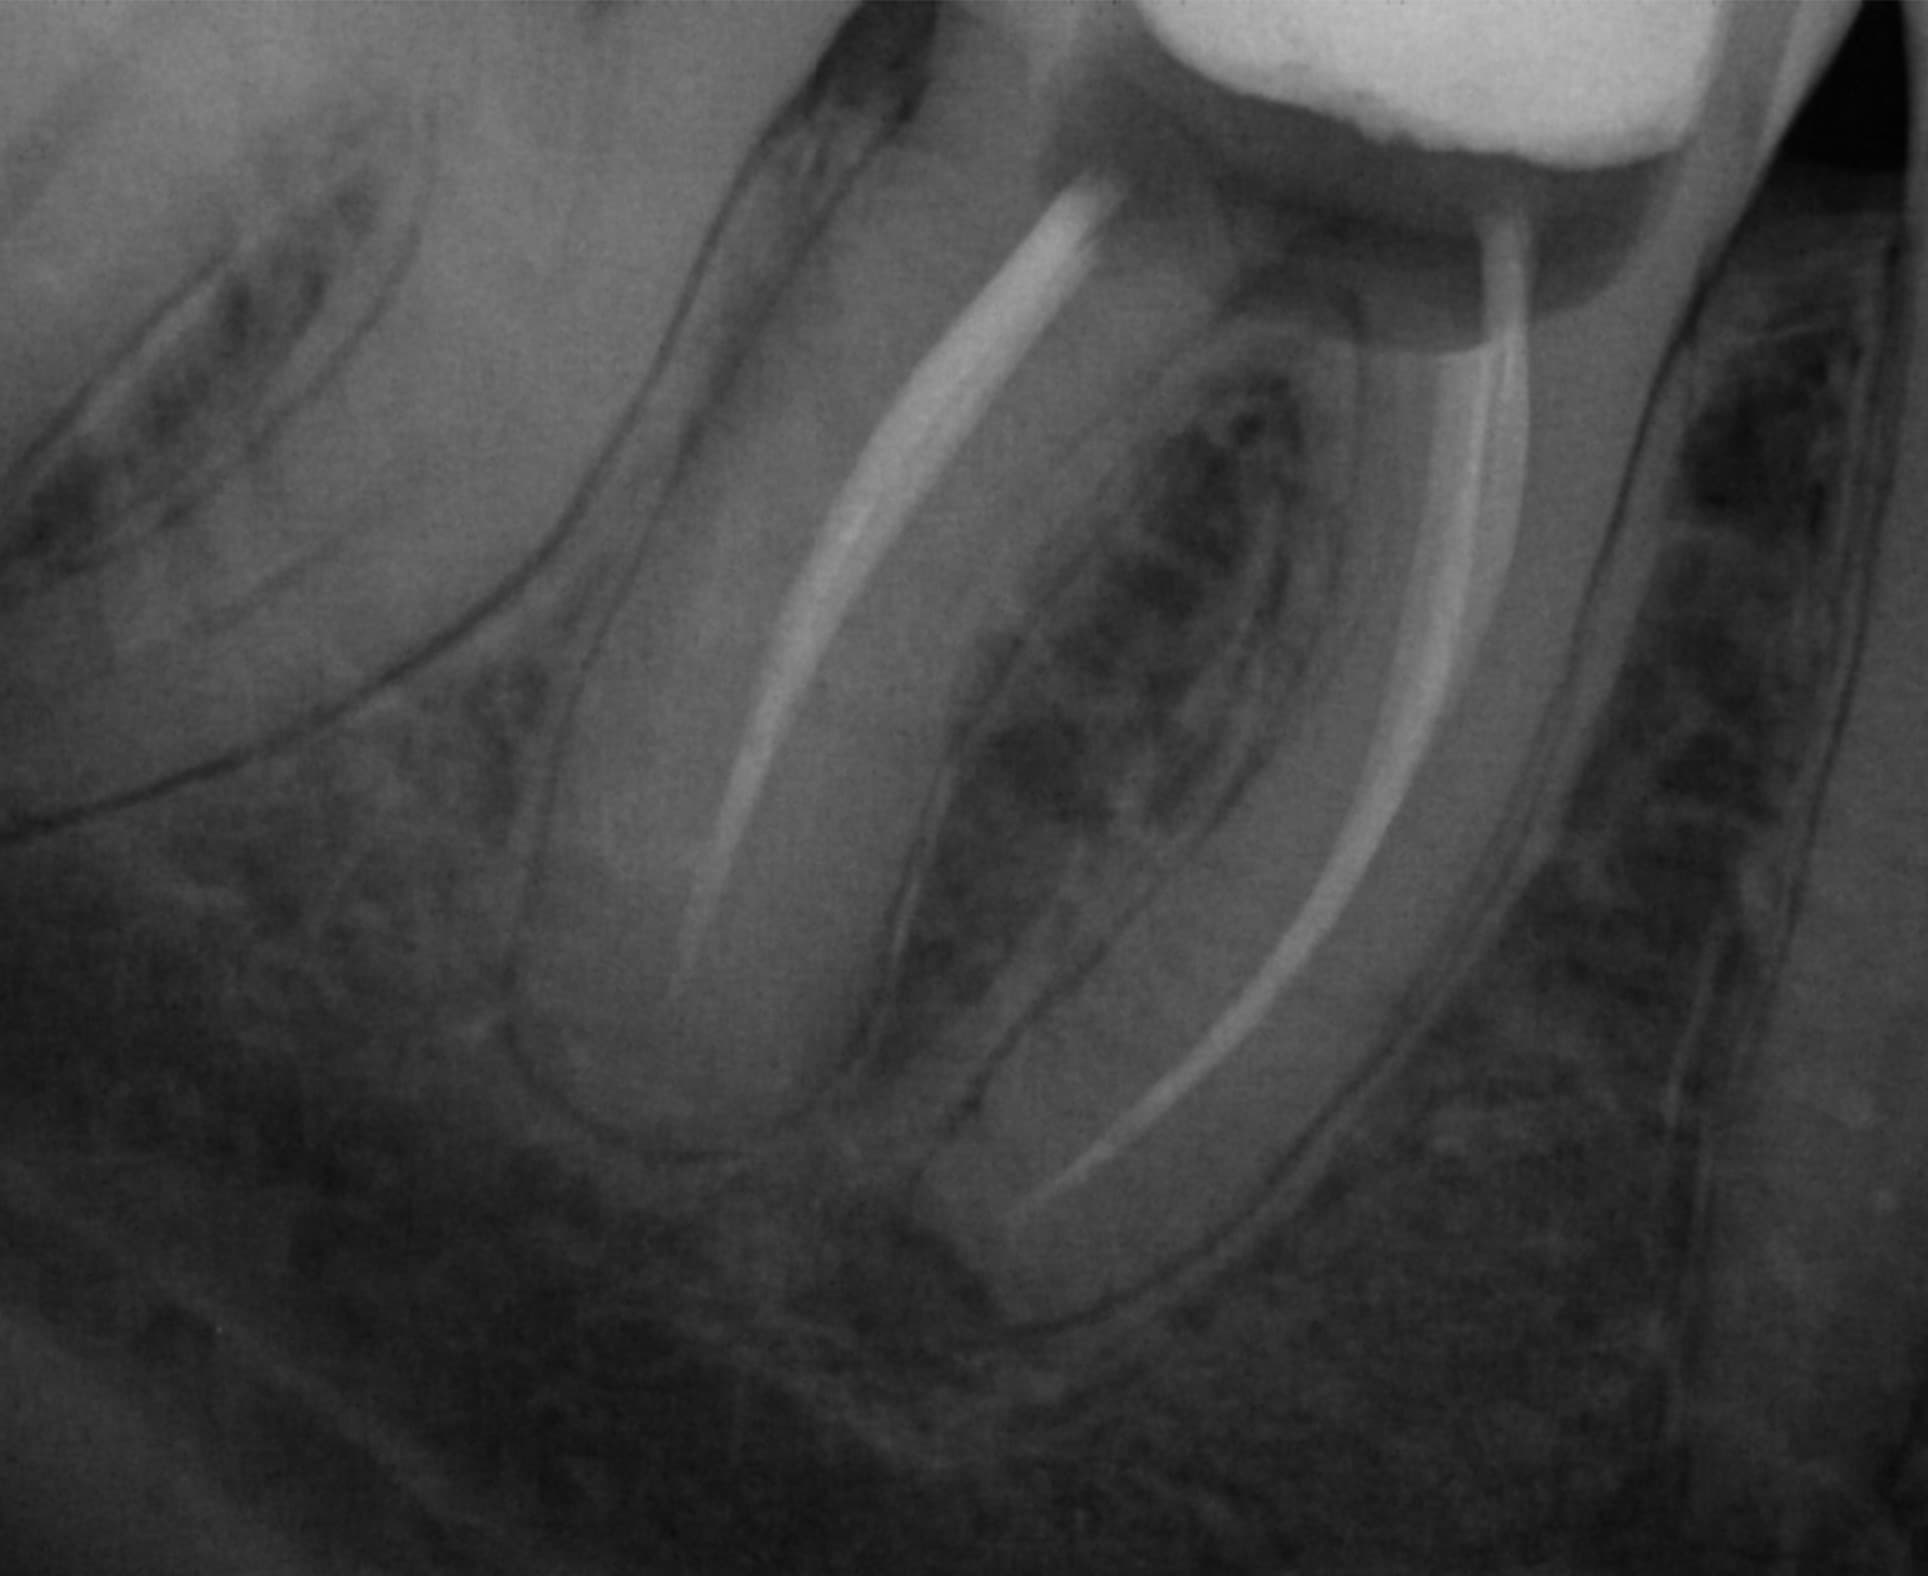 Endodoncja - efekty leczenia Pan Mariusz - Furykclinic